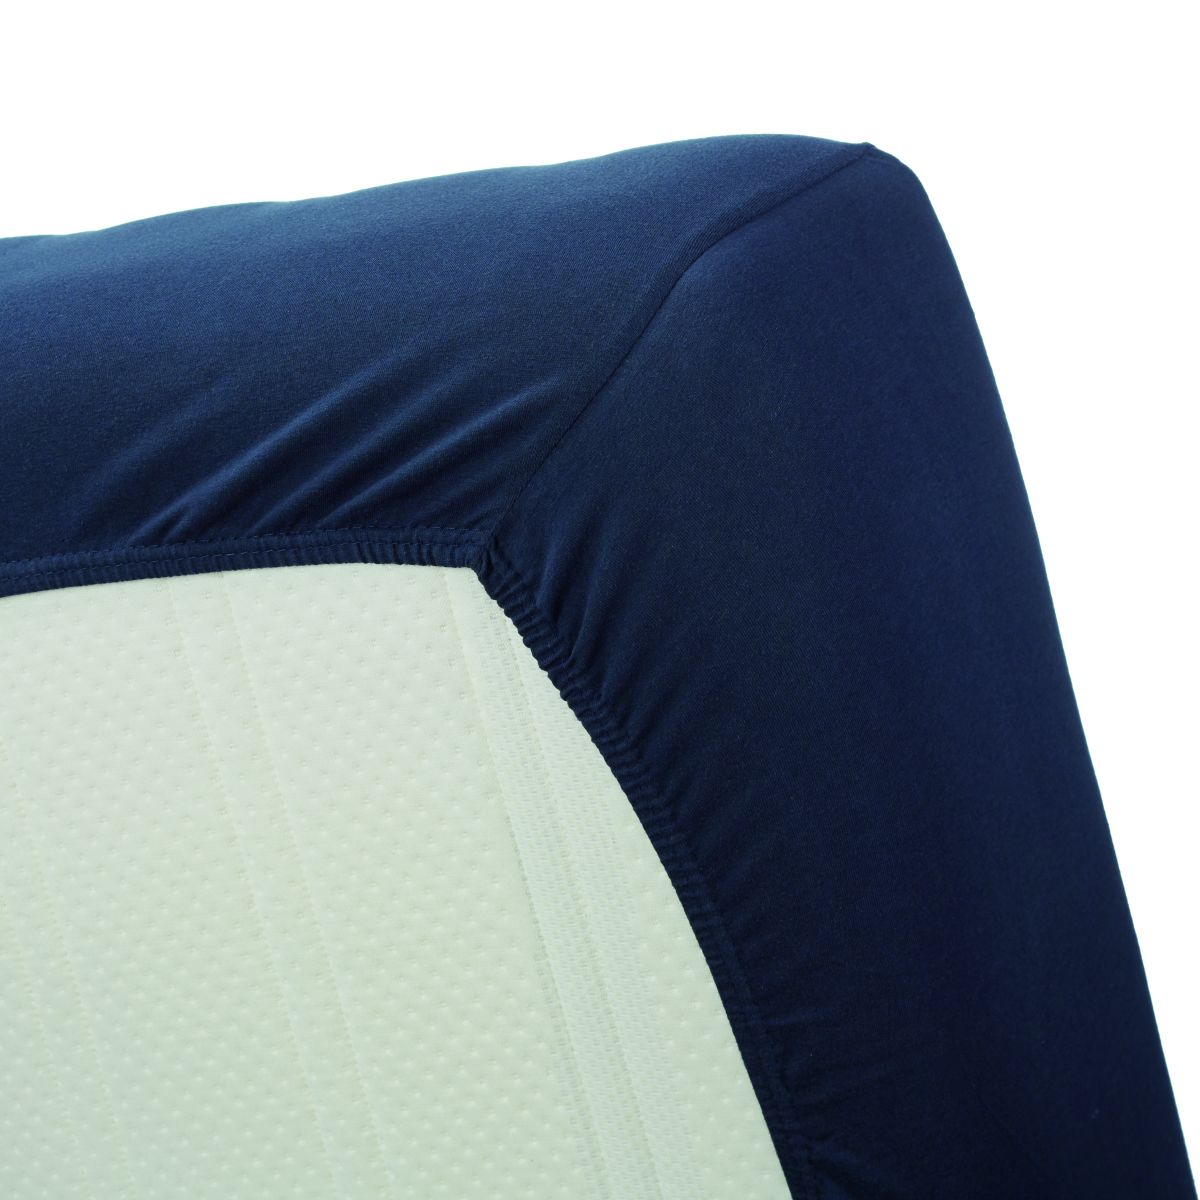 Cearceaf albastru inchis pat cu elastic 160x200 cm Jersey HL Navy